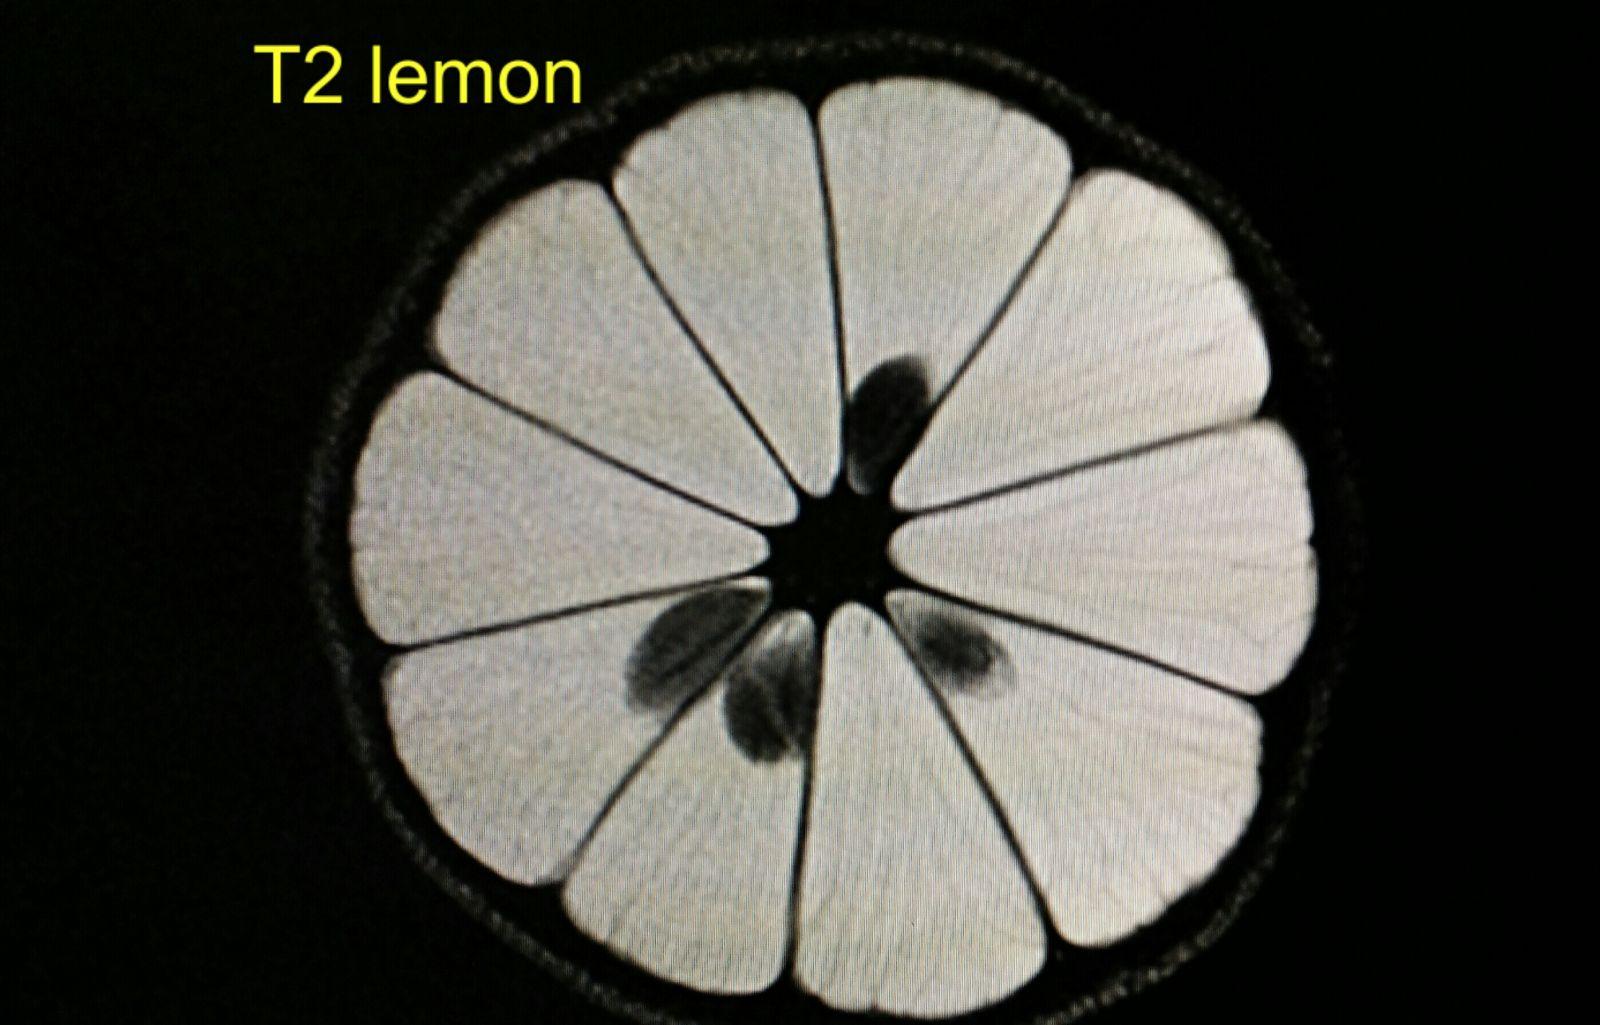 T2 lemon